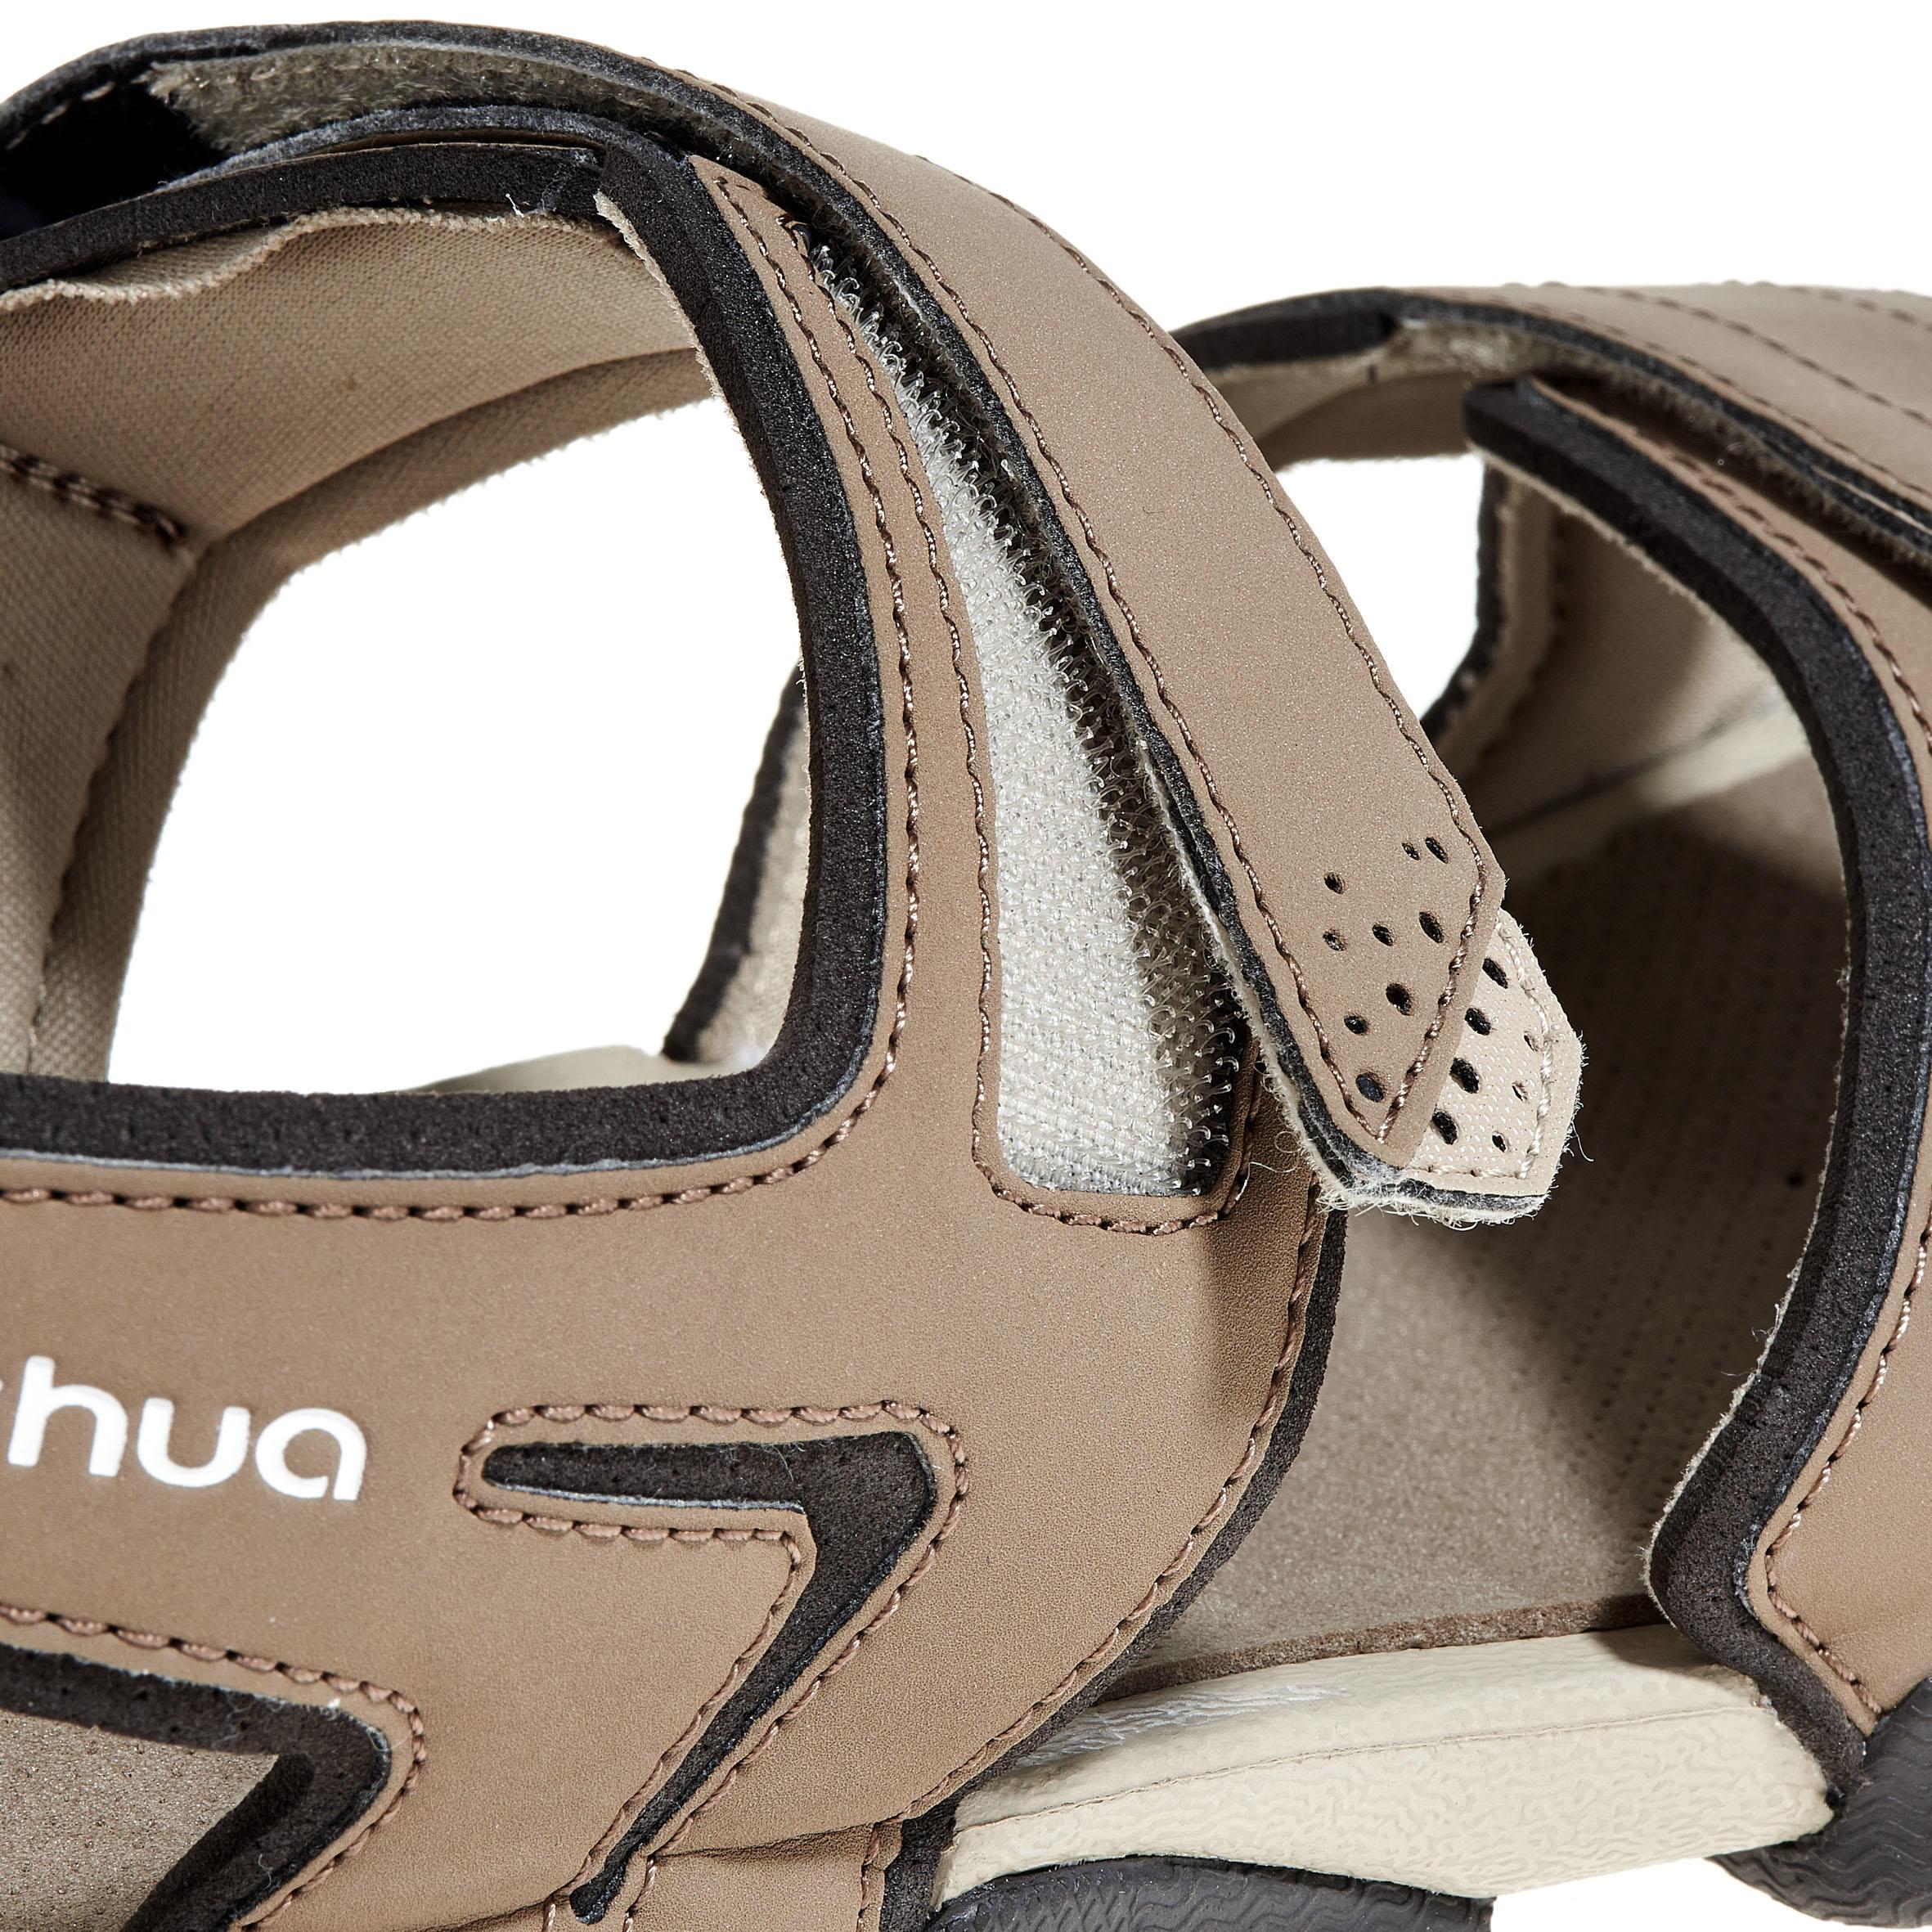 NH100 men's country walking sandals - beige